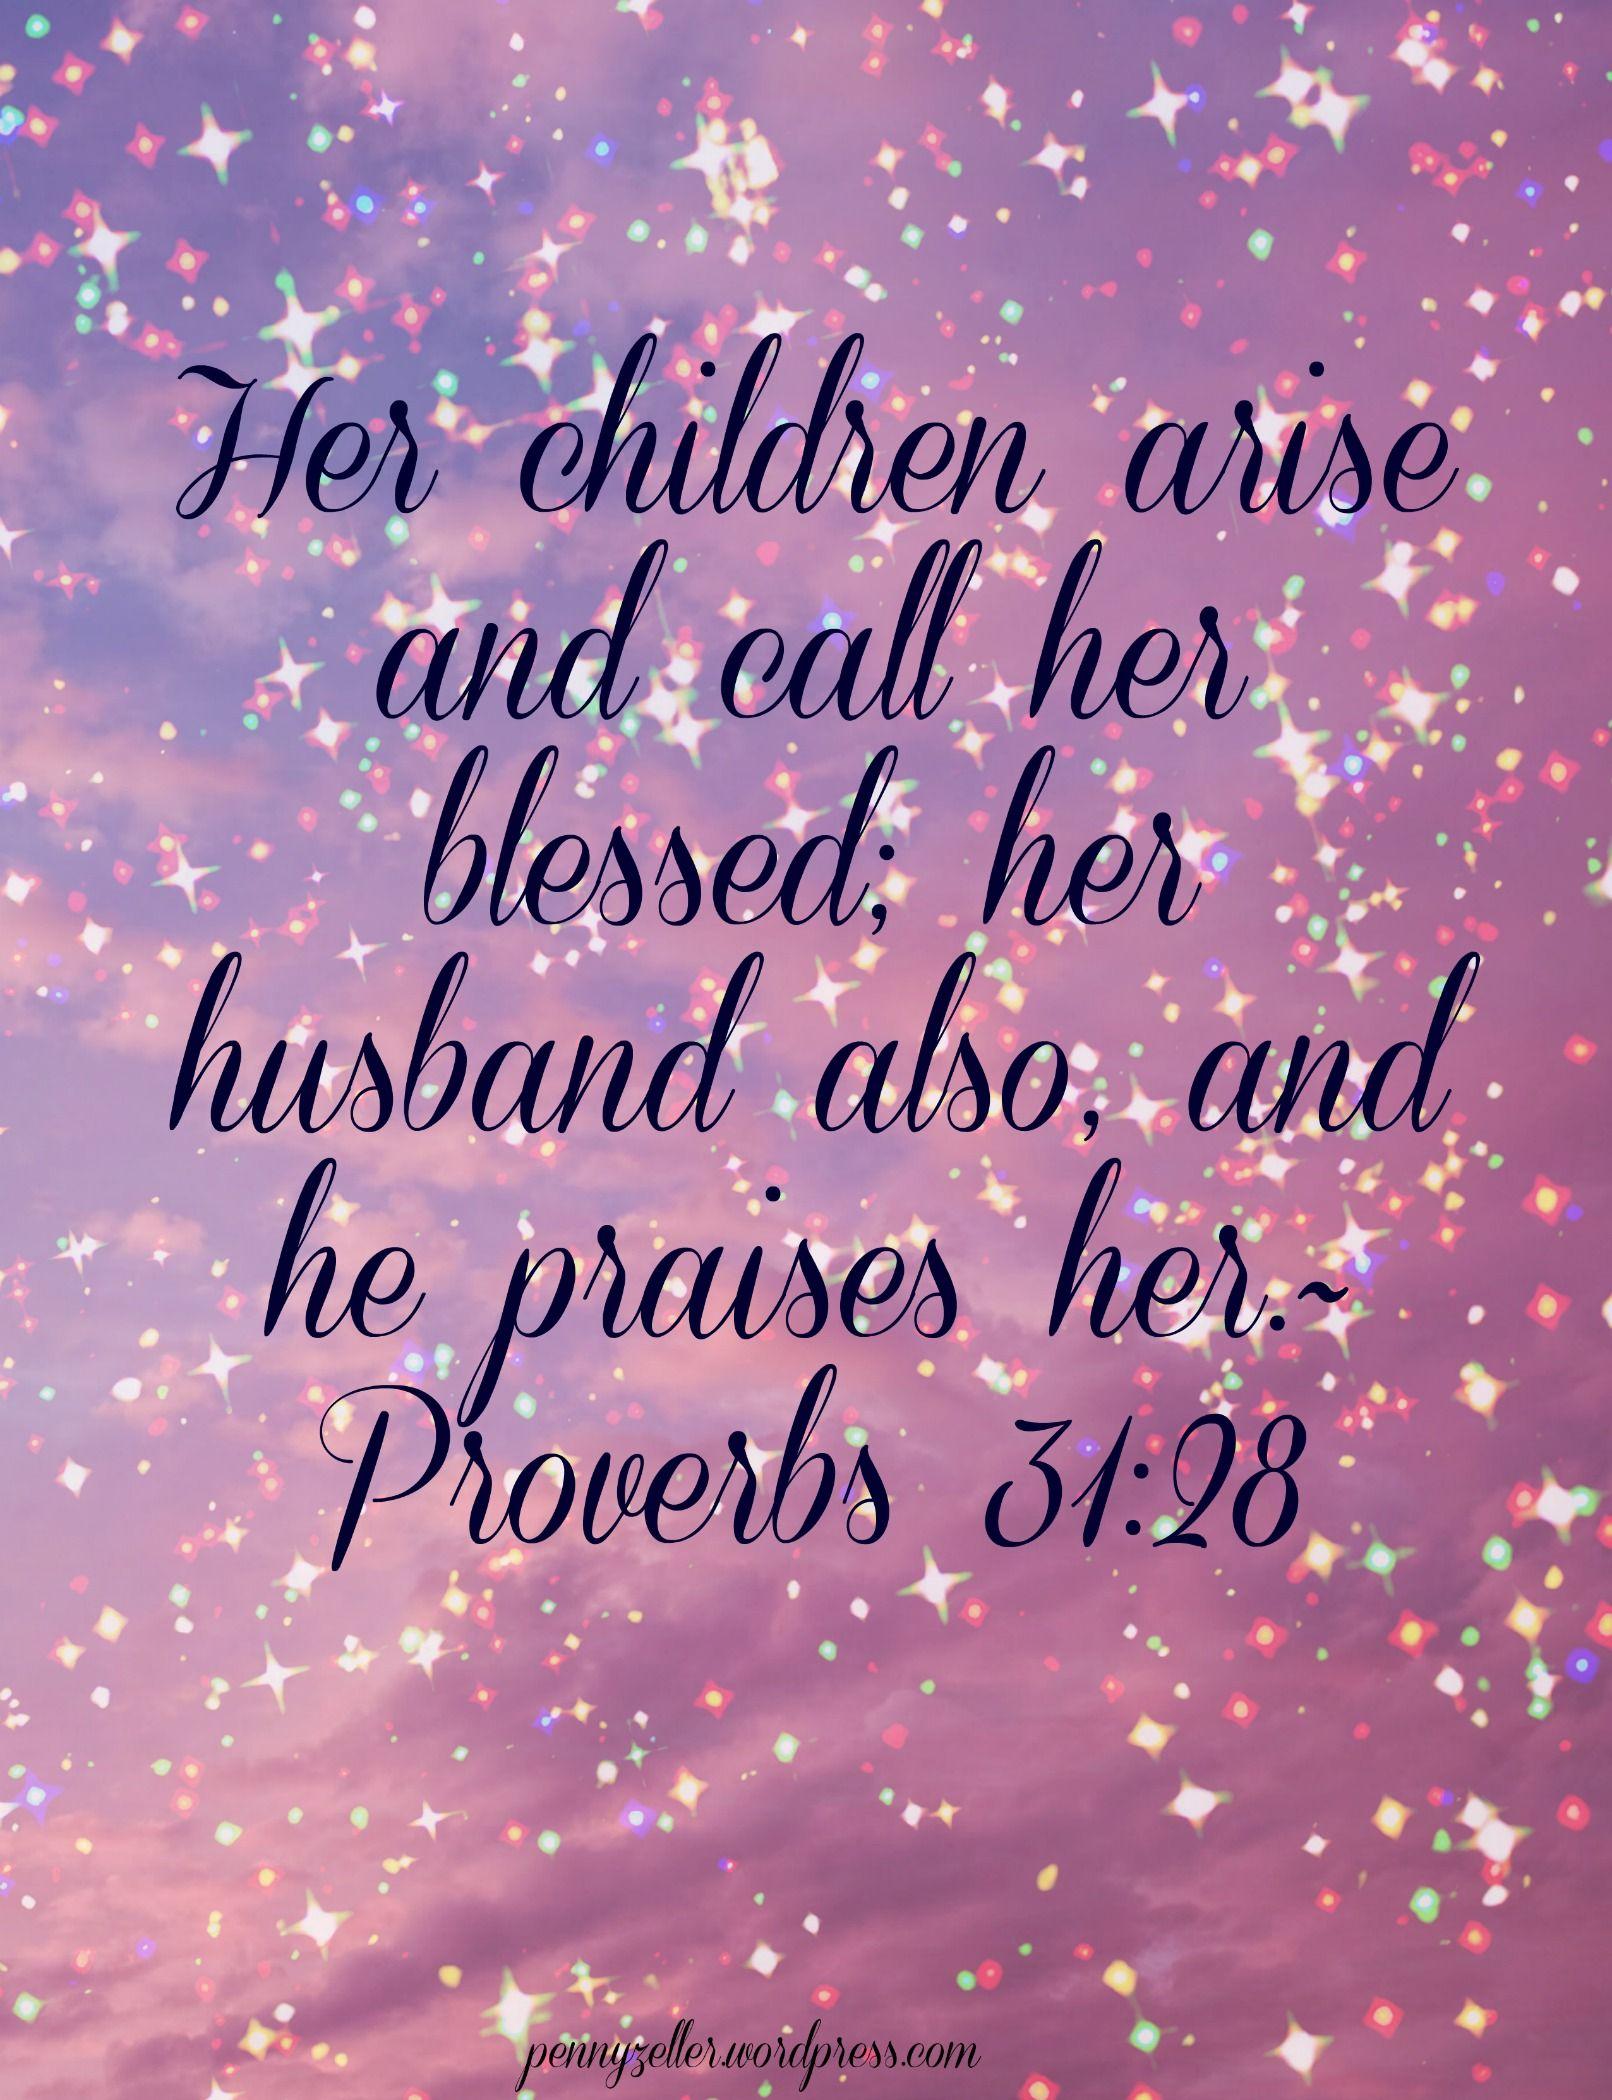 Proverbs 31:28 #Bible #Scripture